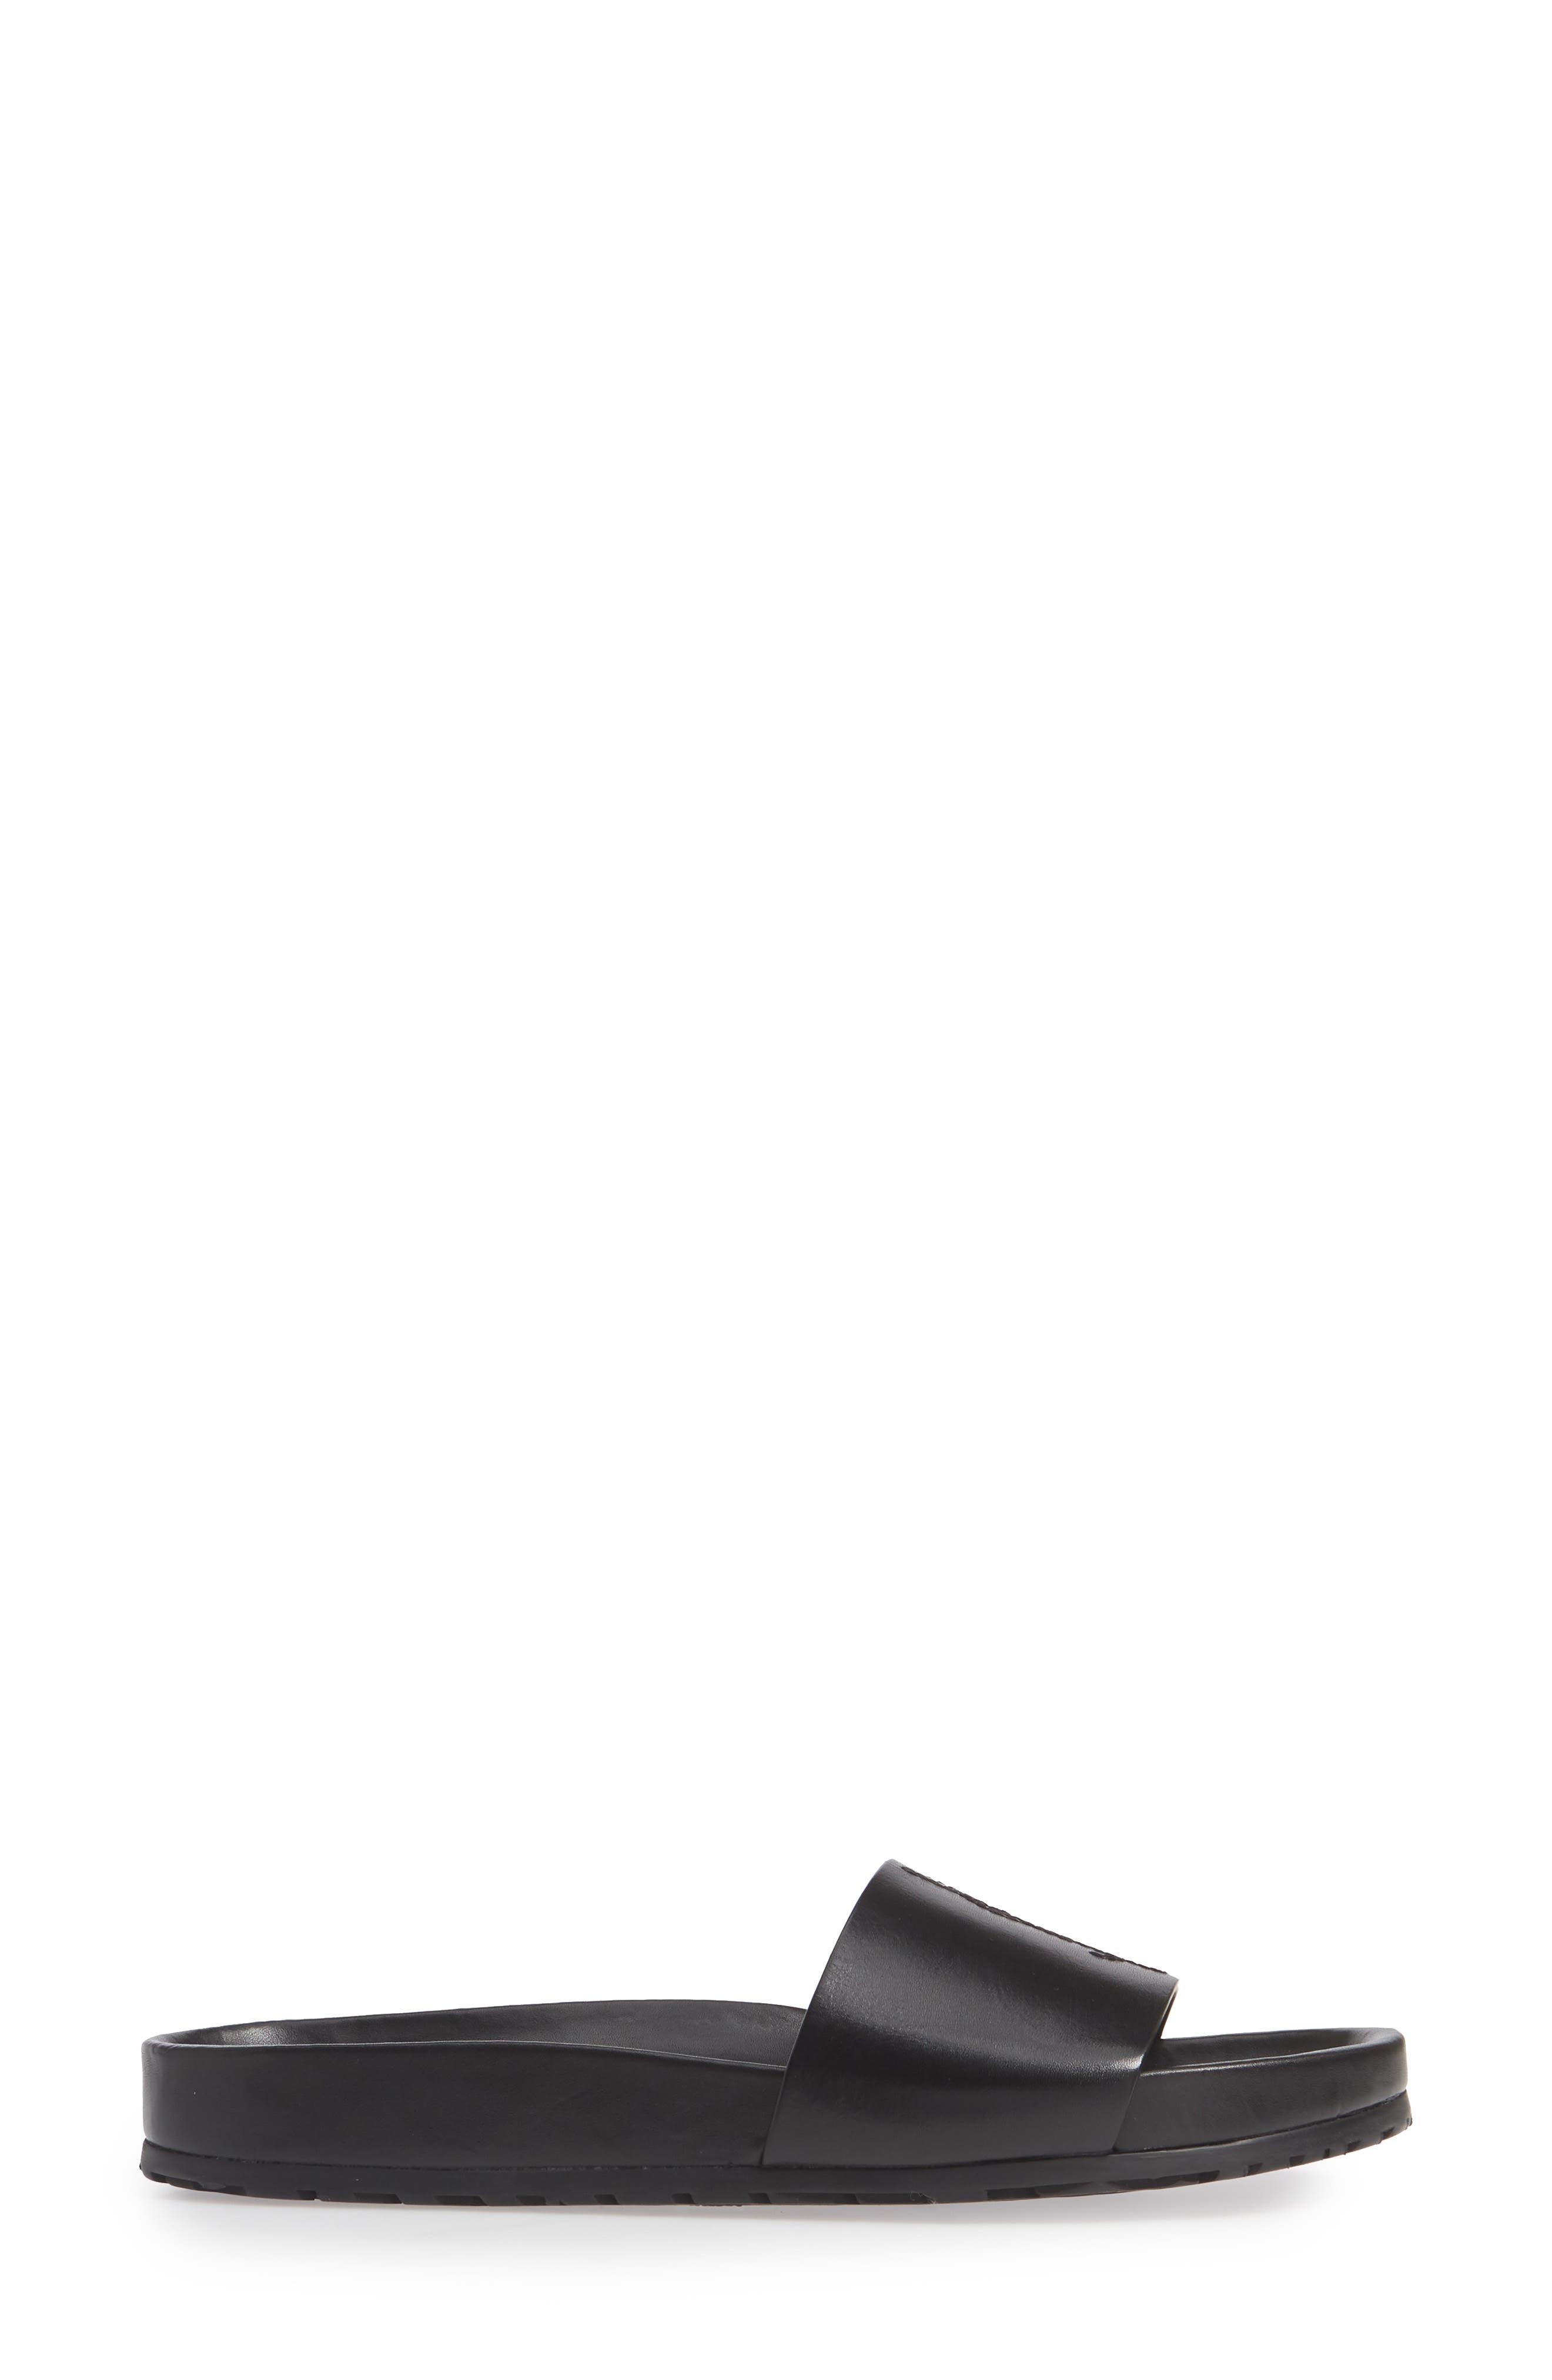 SAINT LAURENT,                             Jimmy Logo Slide Sandal,                             Alternate thumbnail 3, color,                             BLACK LEATHER